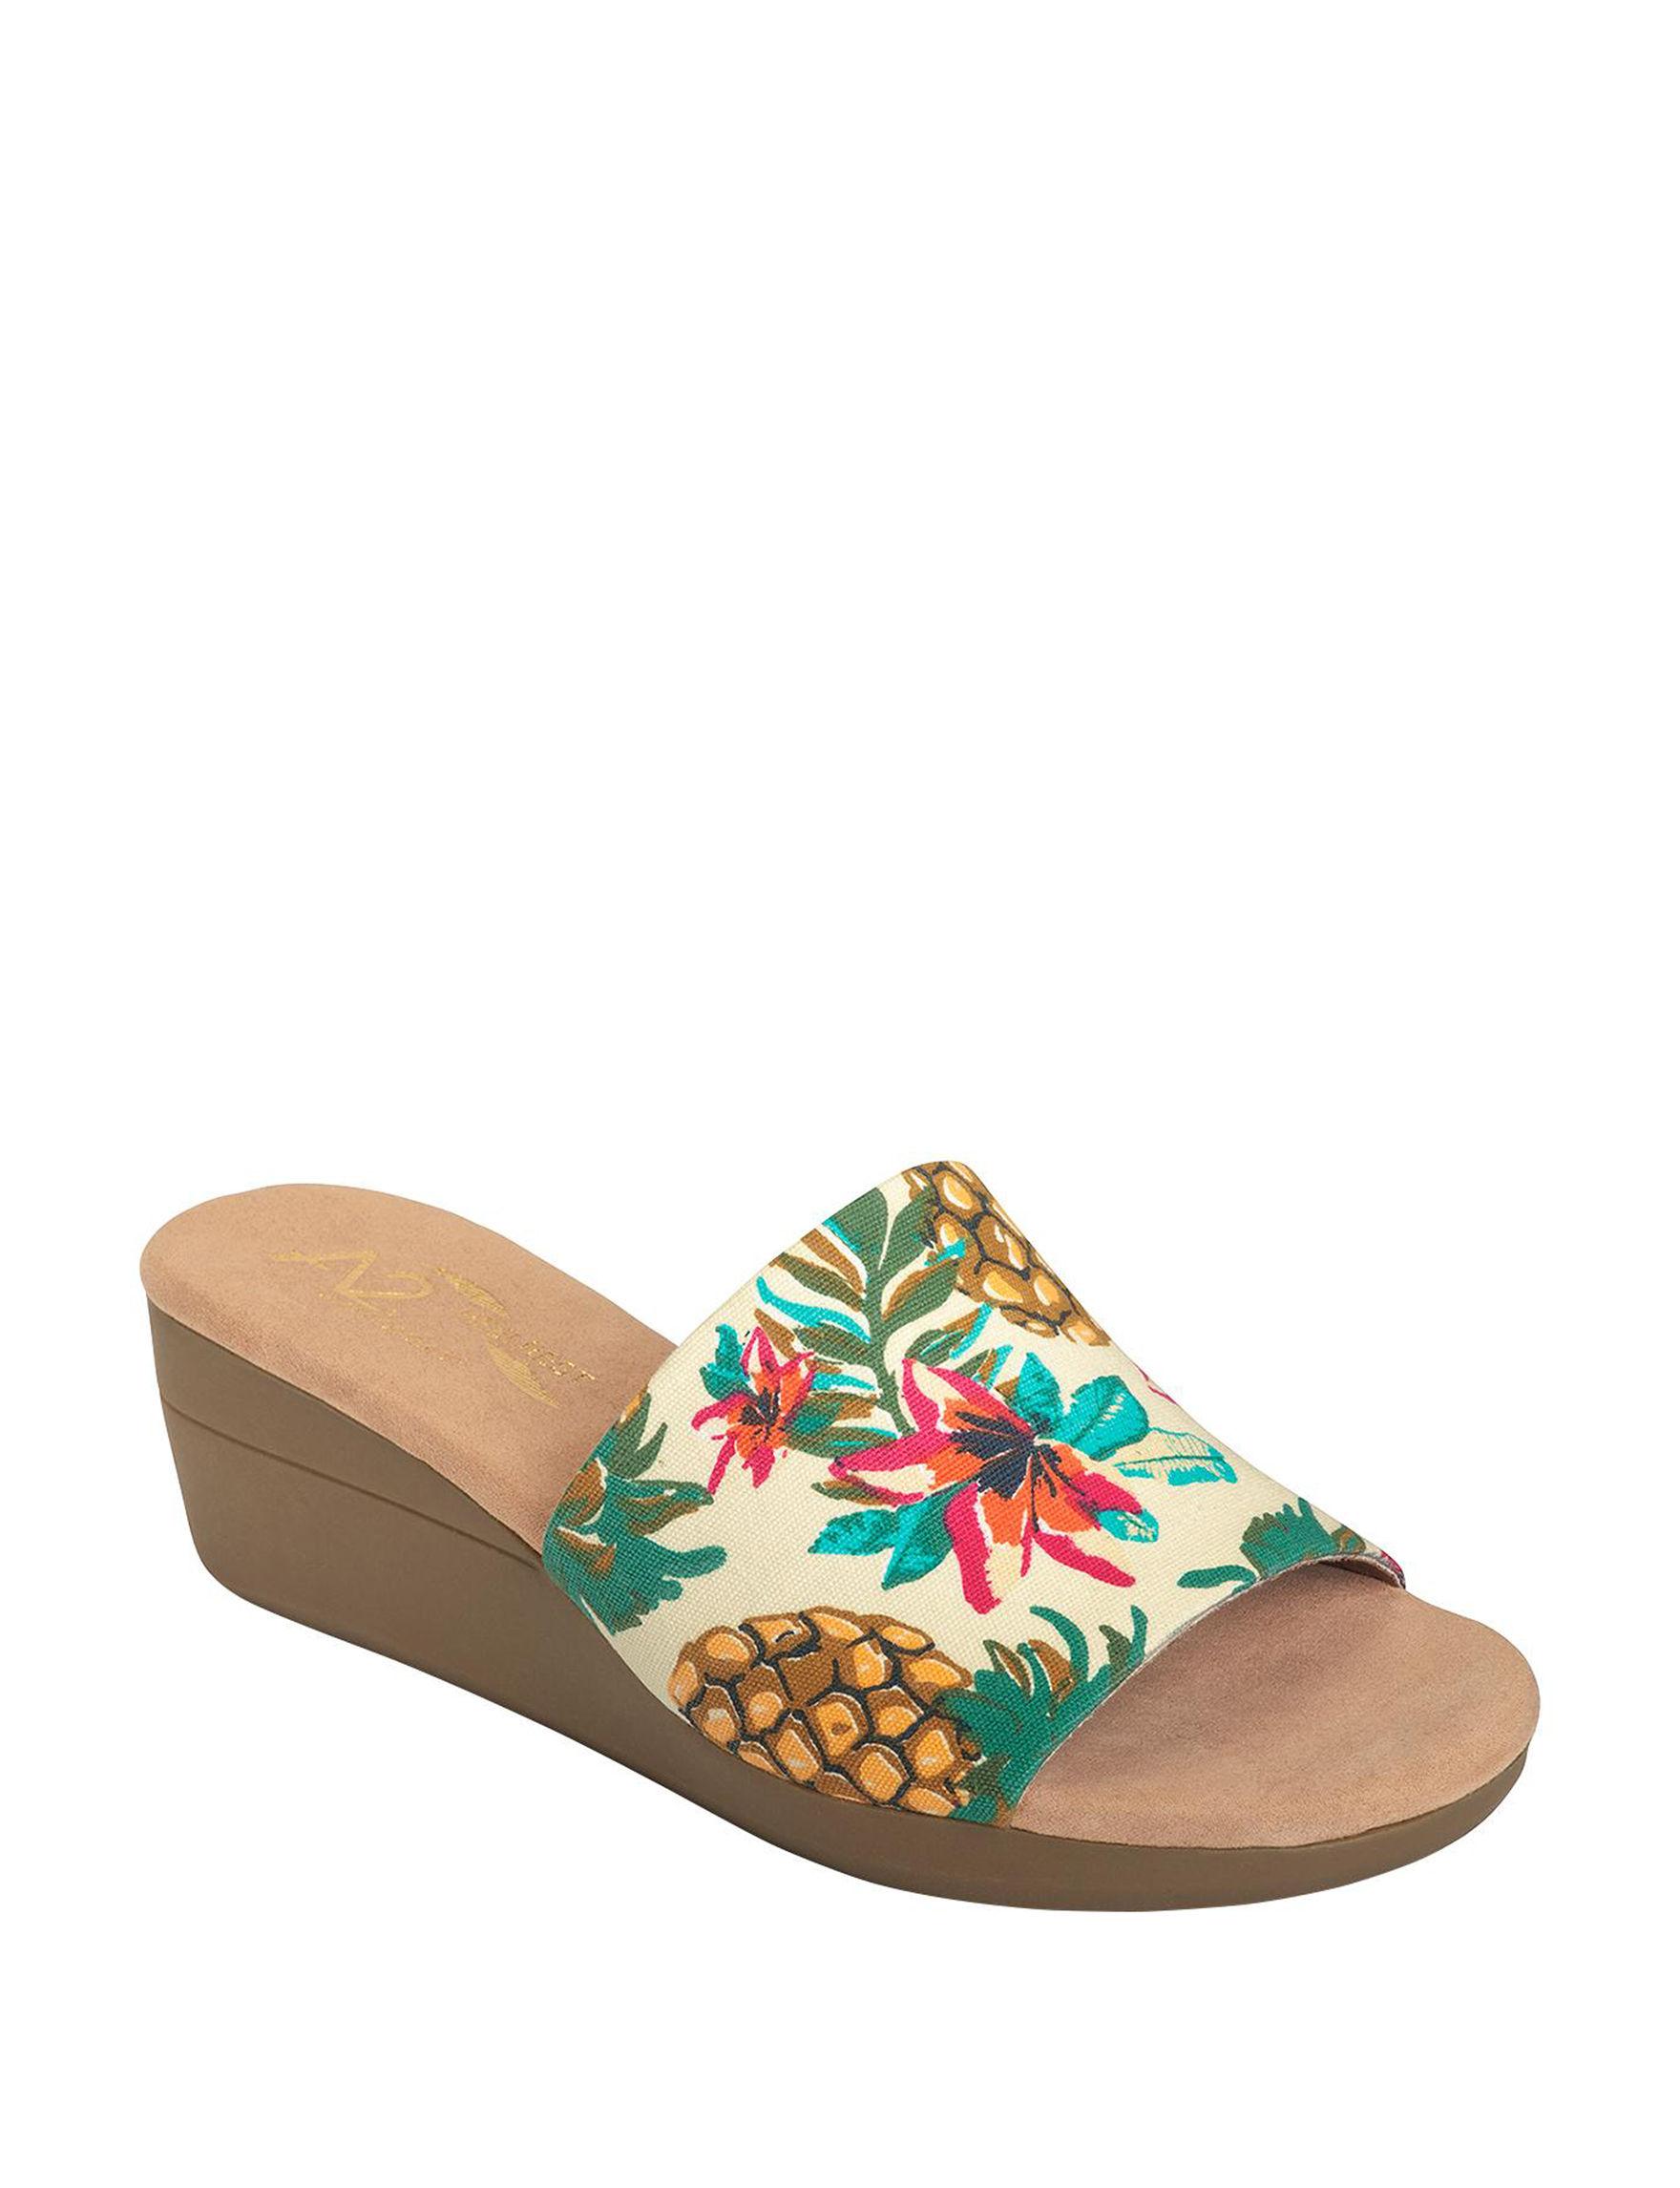 A2 by Aerosoles Multi Wedge Sandals